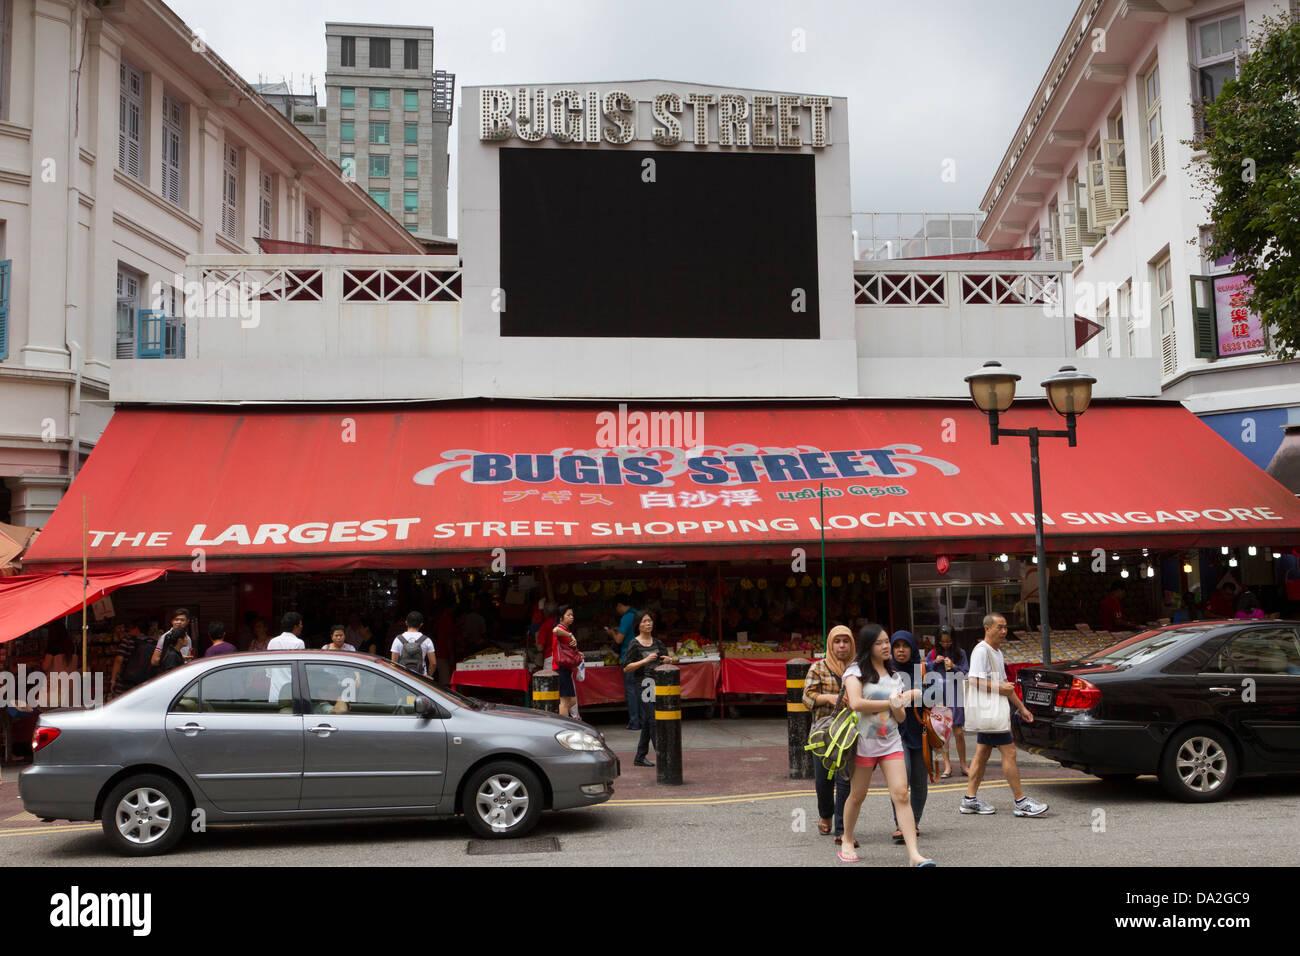 Bugis Street shopping arcade, Bugis, Singapore - Stock Image